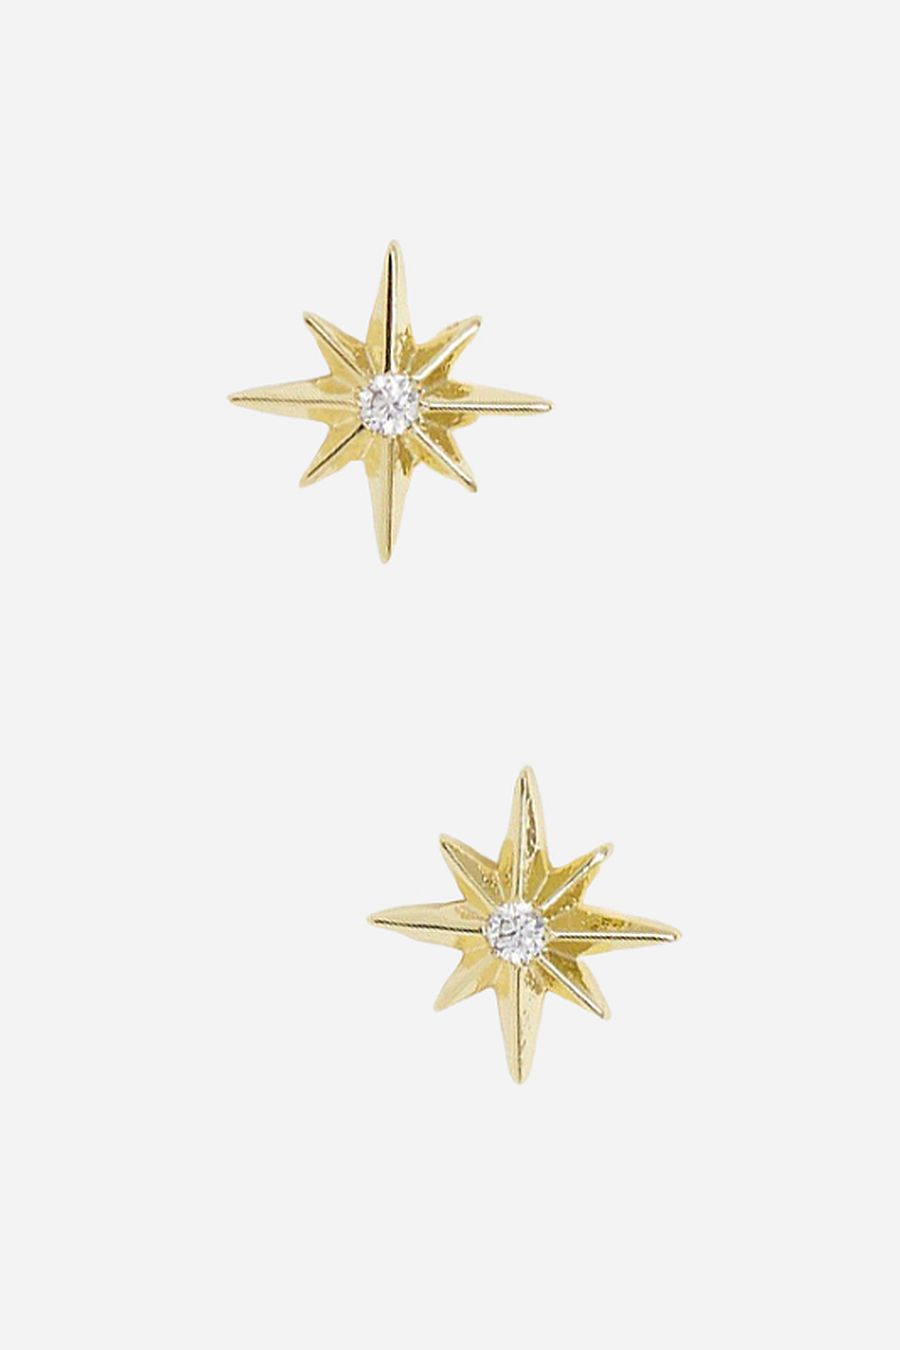 Shashi Northern Star Stud